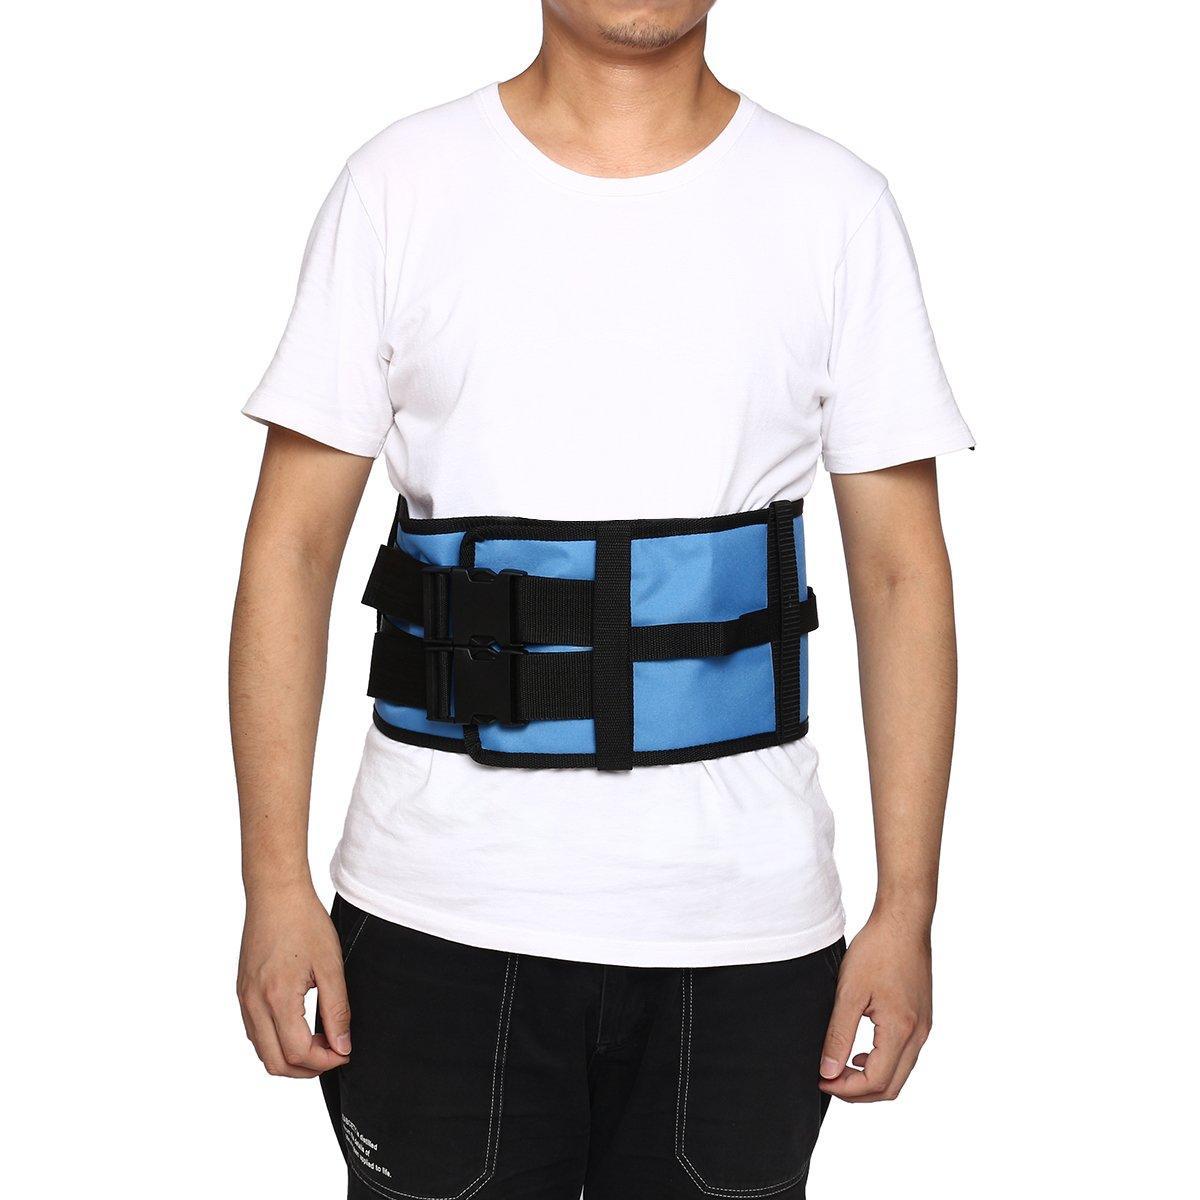 Waist Support Belt Elderly Standing Practical Assistant Rehabilitation Training Belt